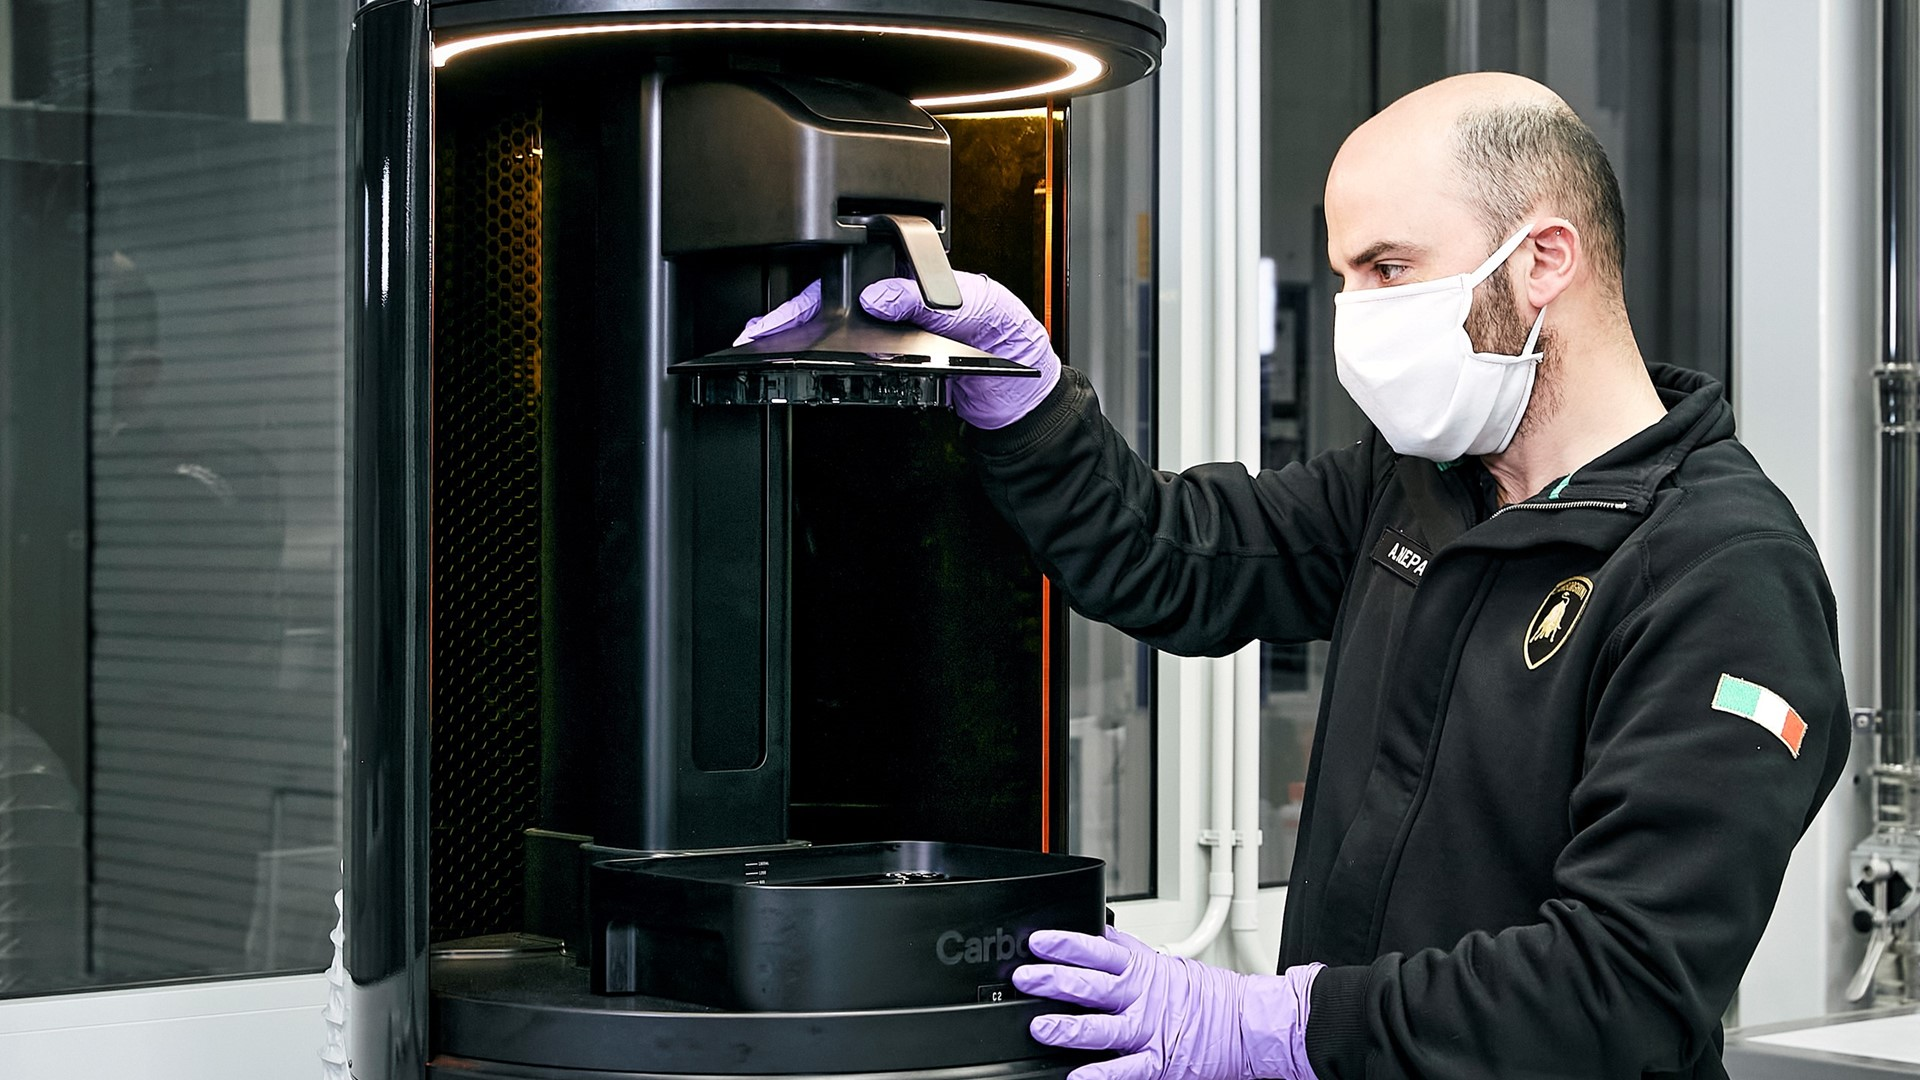 Automobili Lamborghini starts production of surgical masks and medical shields for use in Coronavirus pandemic - Image 1